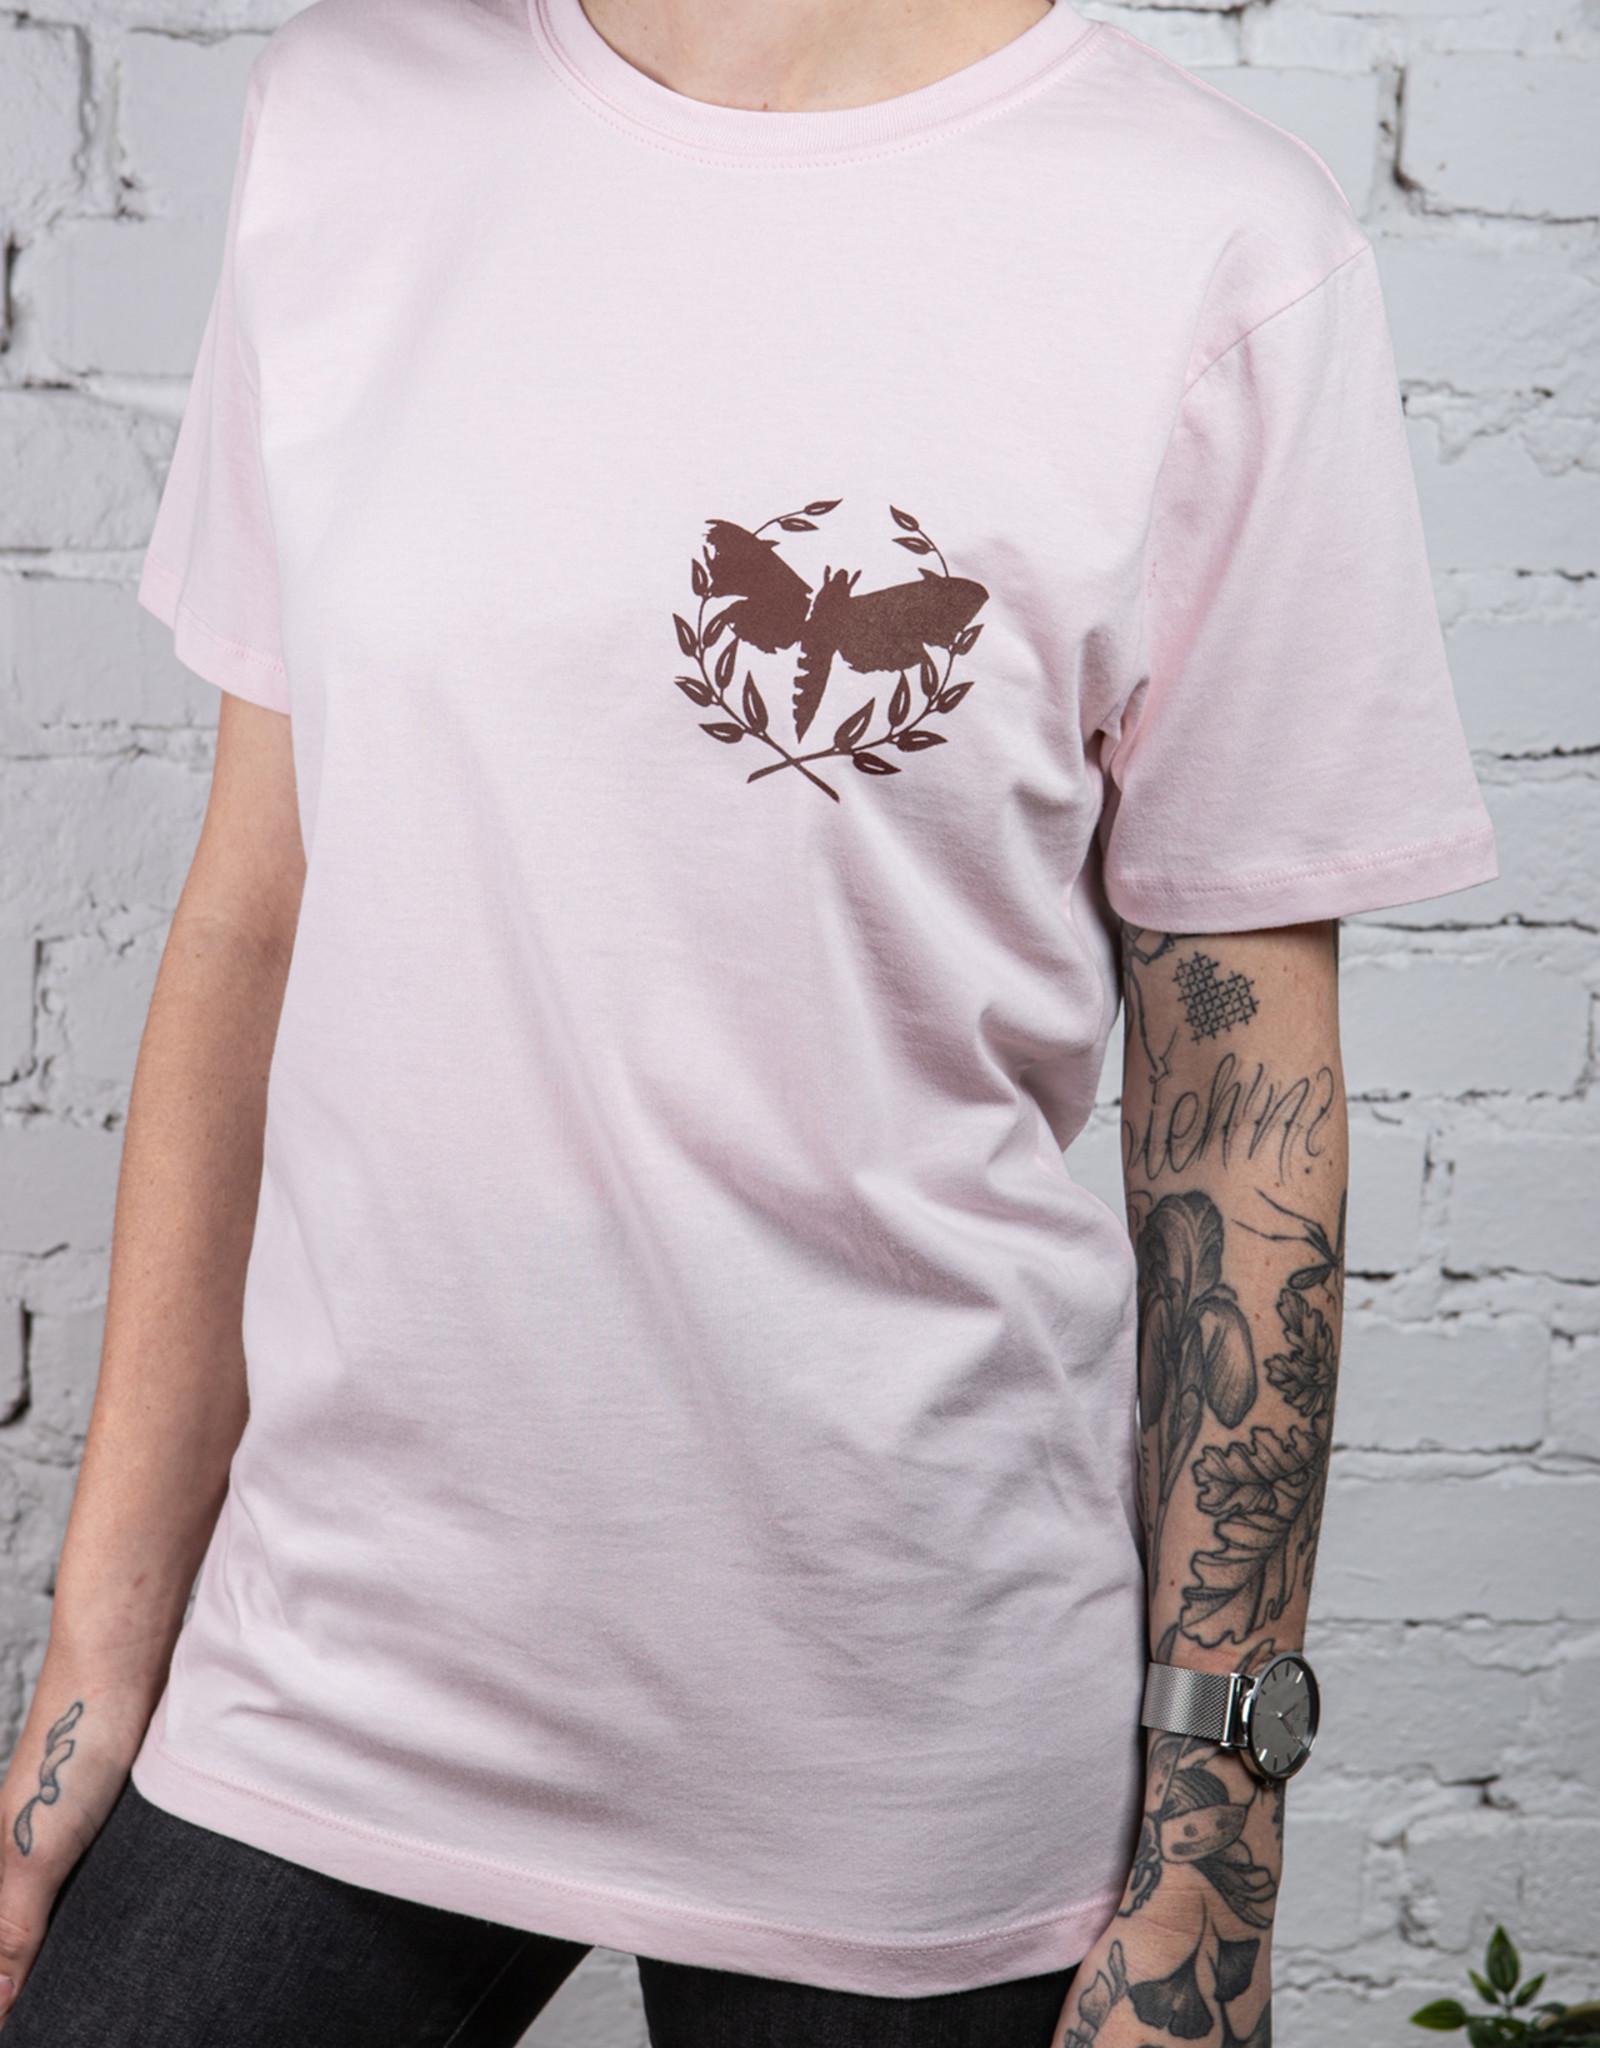 Motte Classic Shirt - pink